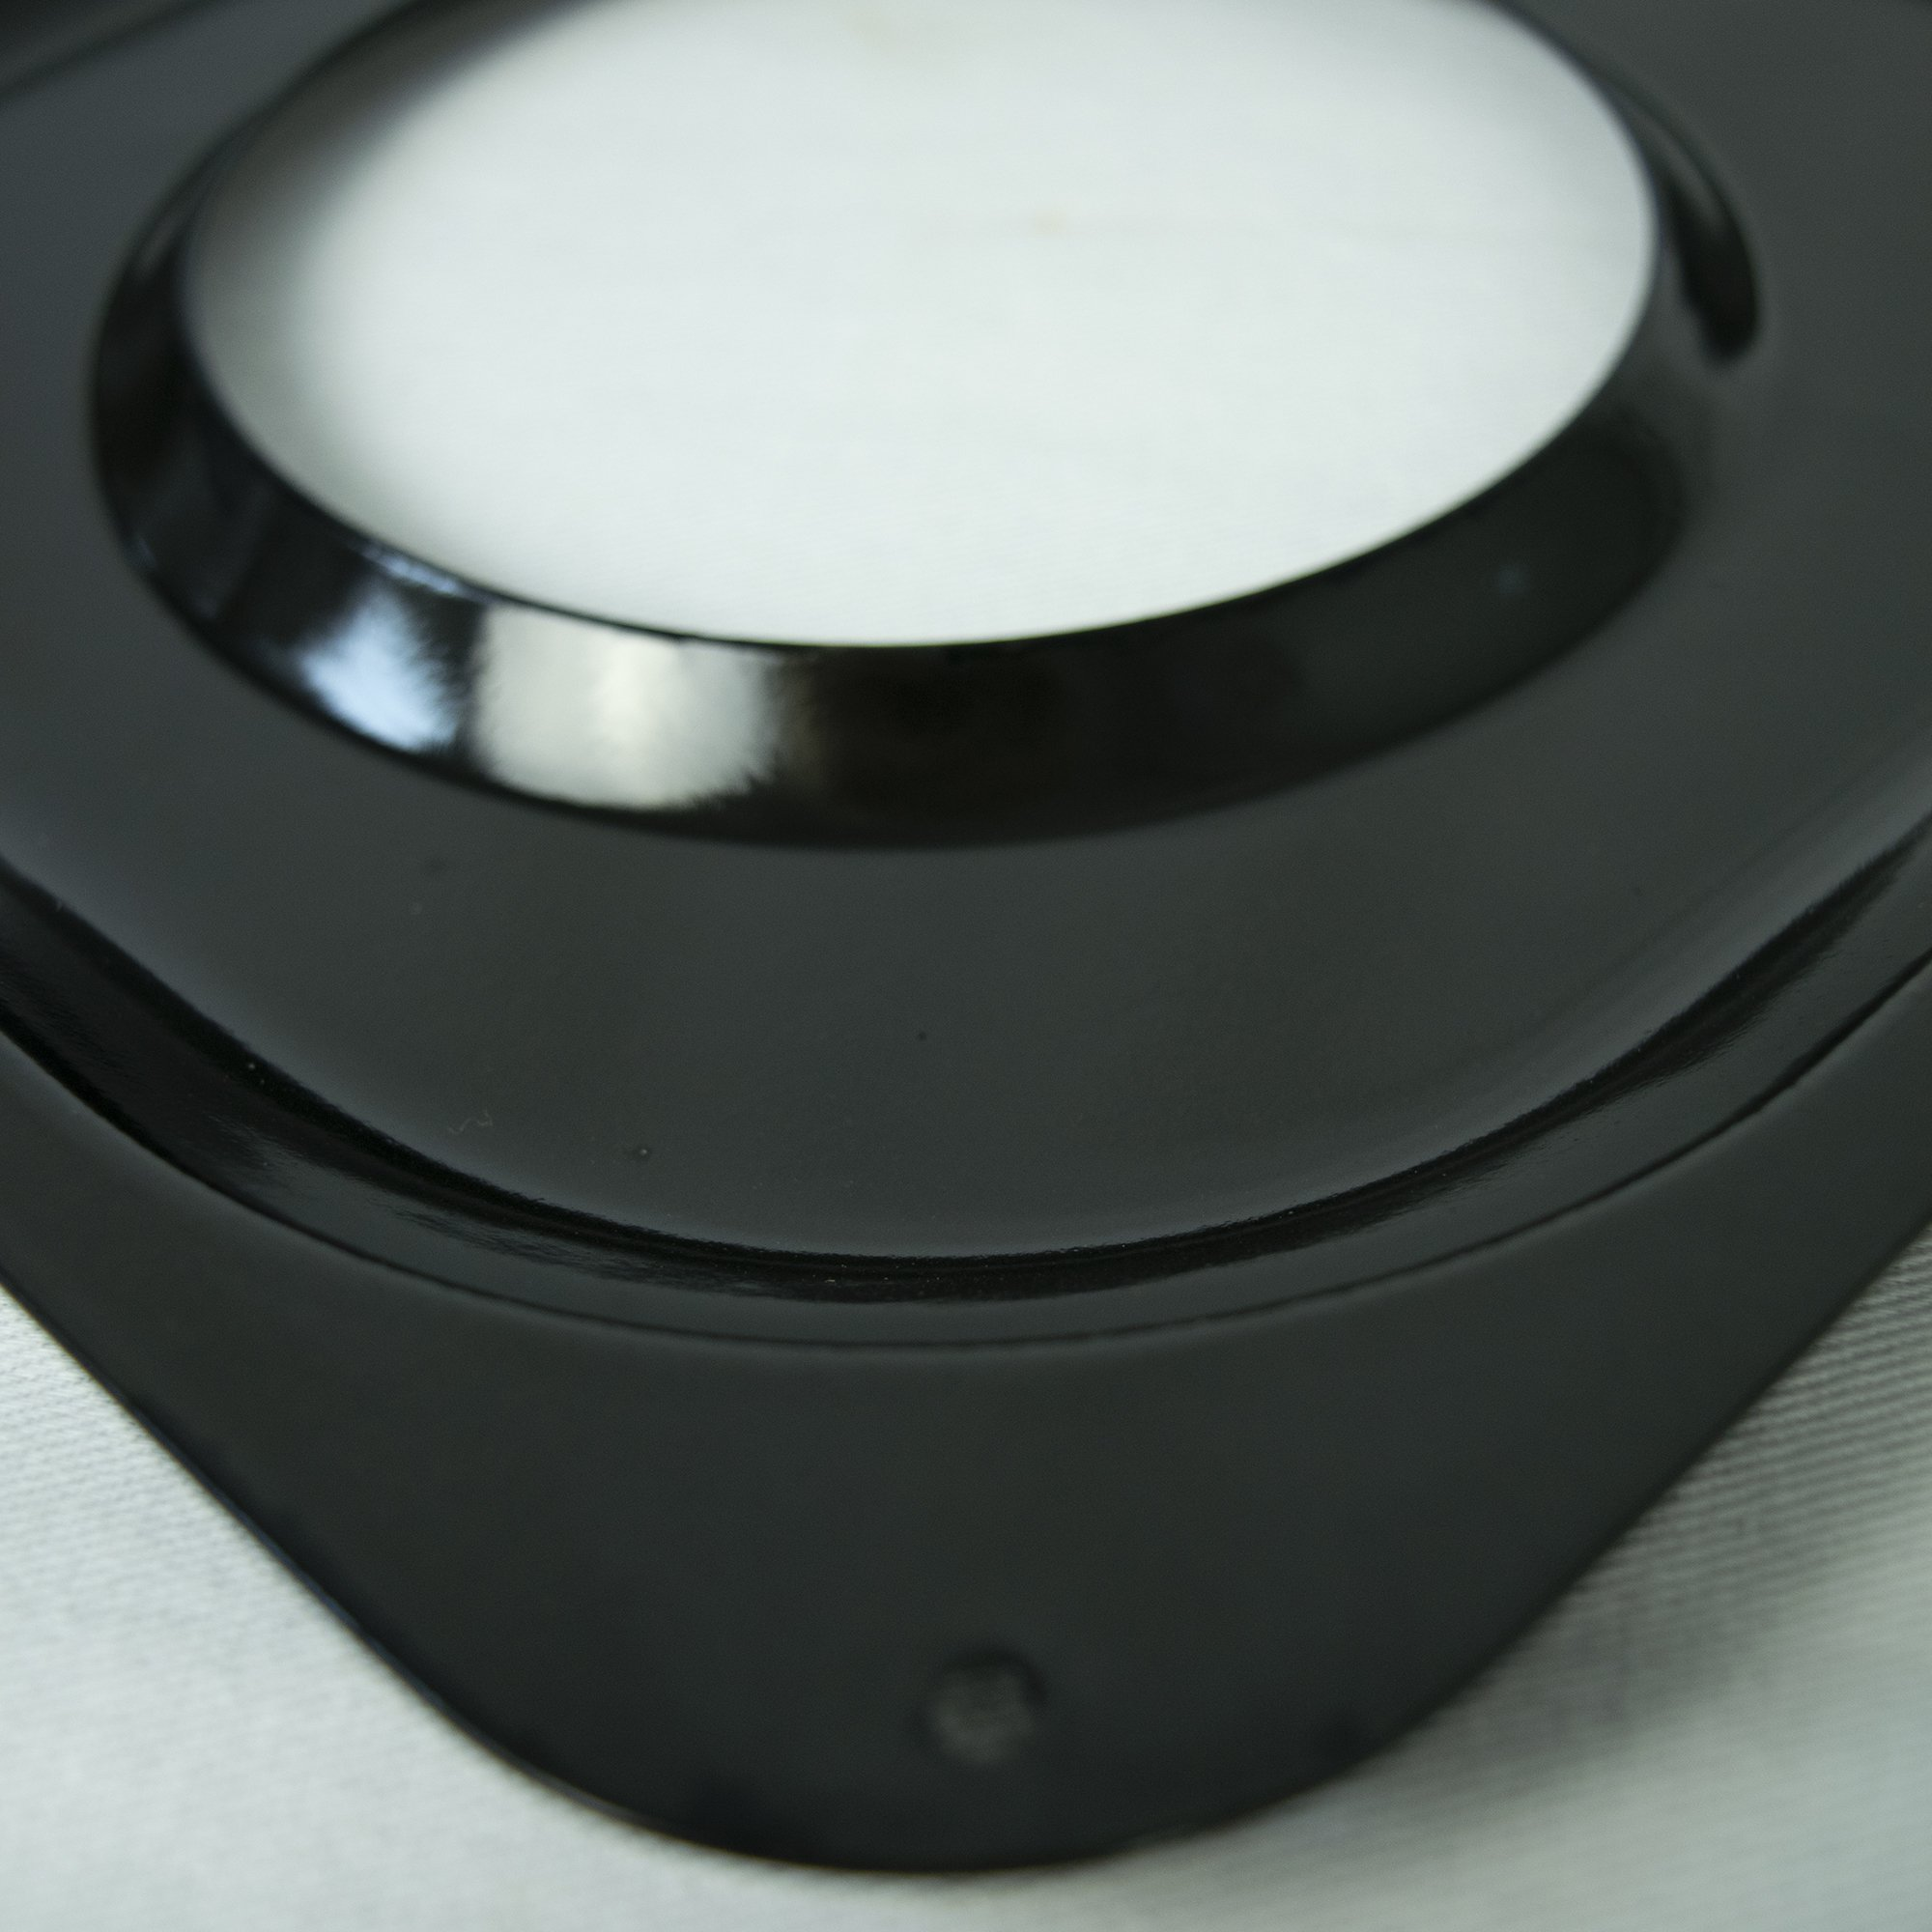 Range Kleen Black Porcelain Rectangular Gas Stove Drip